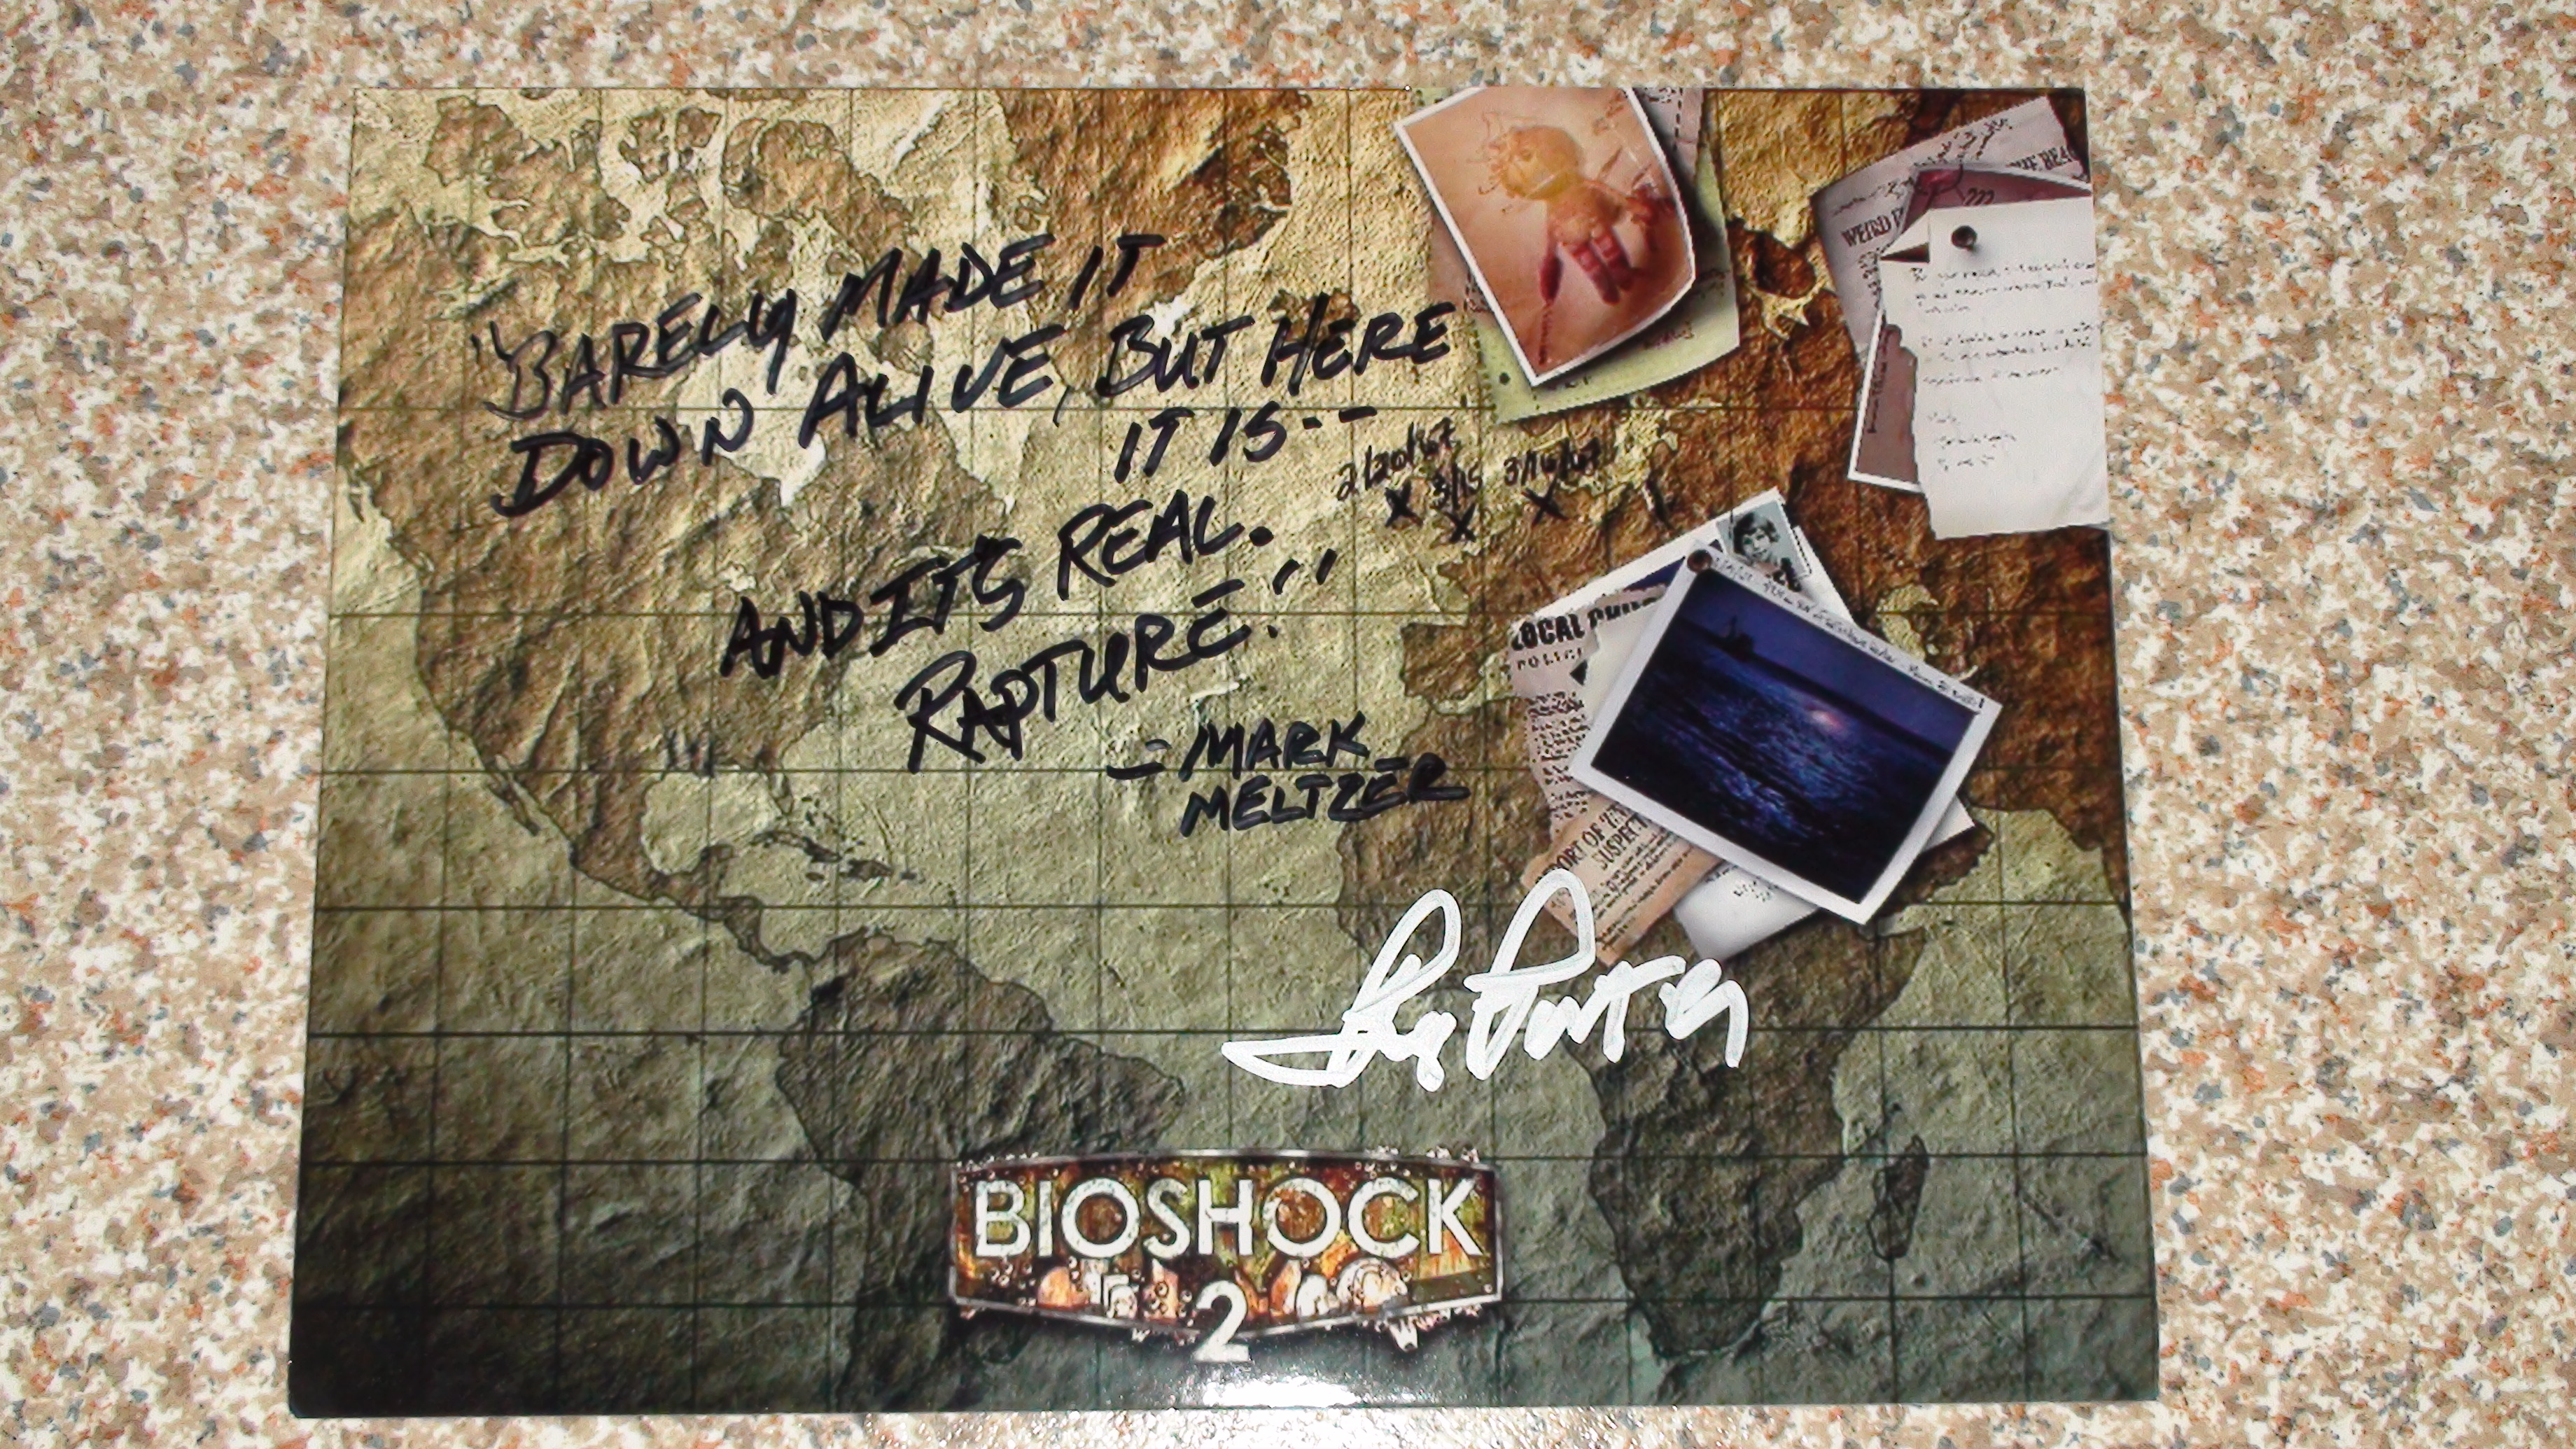 Bioshock 2 - Ray Porter